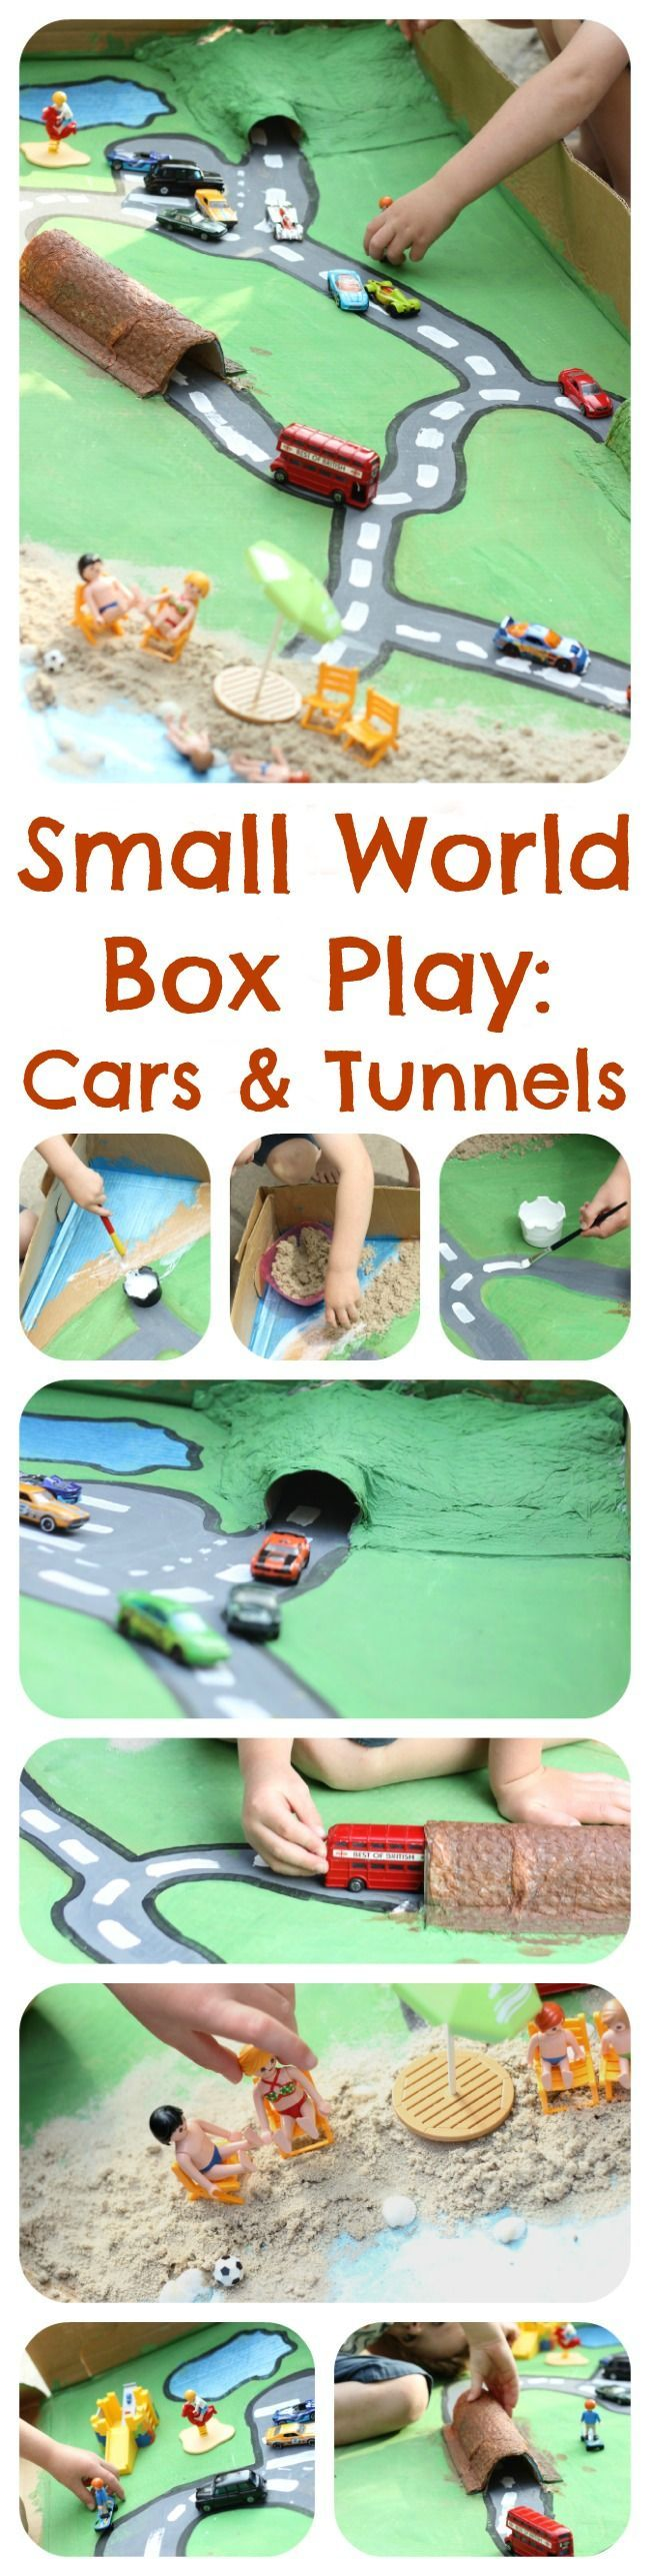 Small World Box Play - Cars & Tunnels